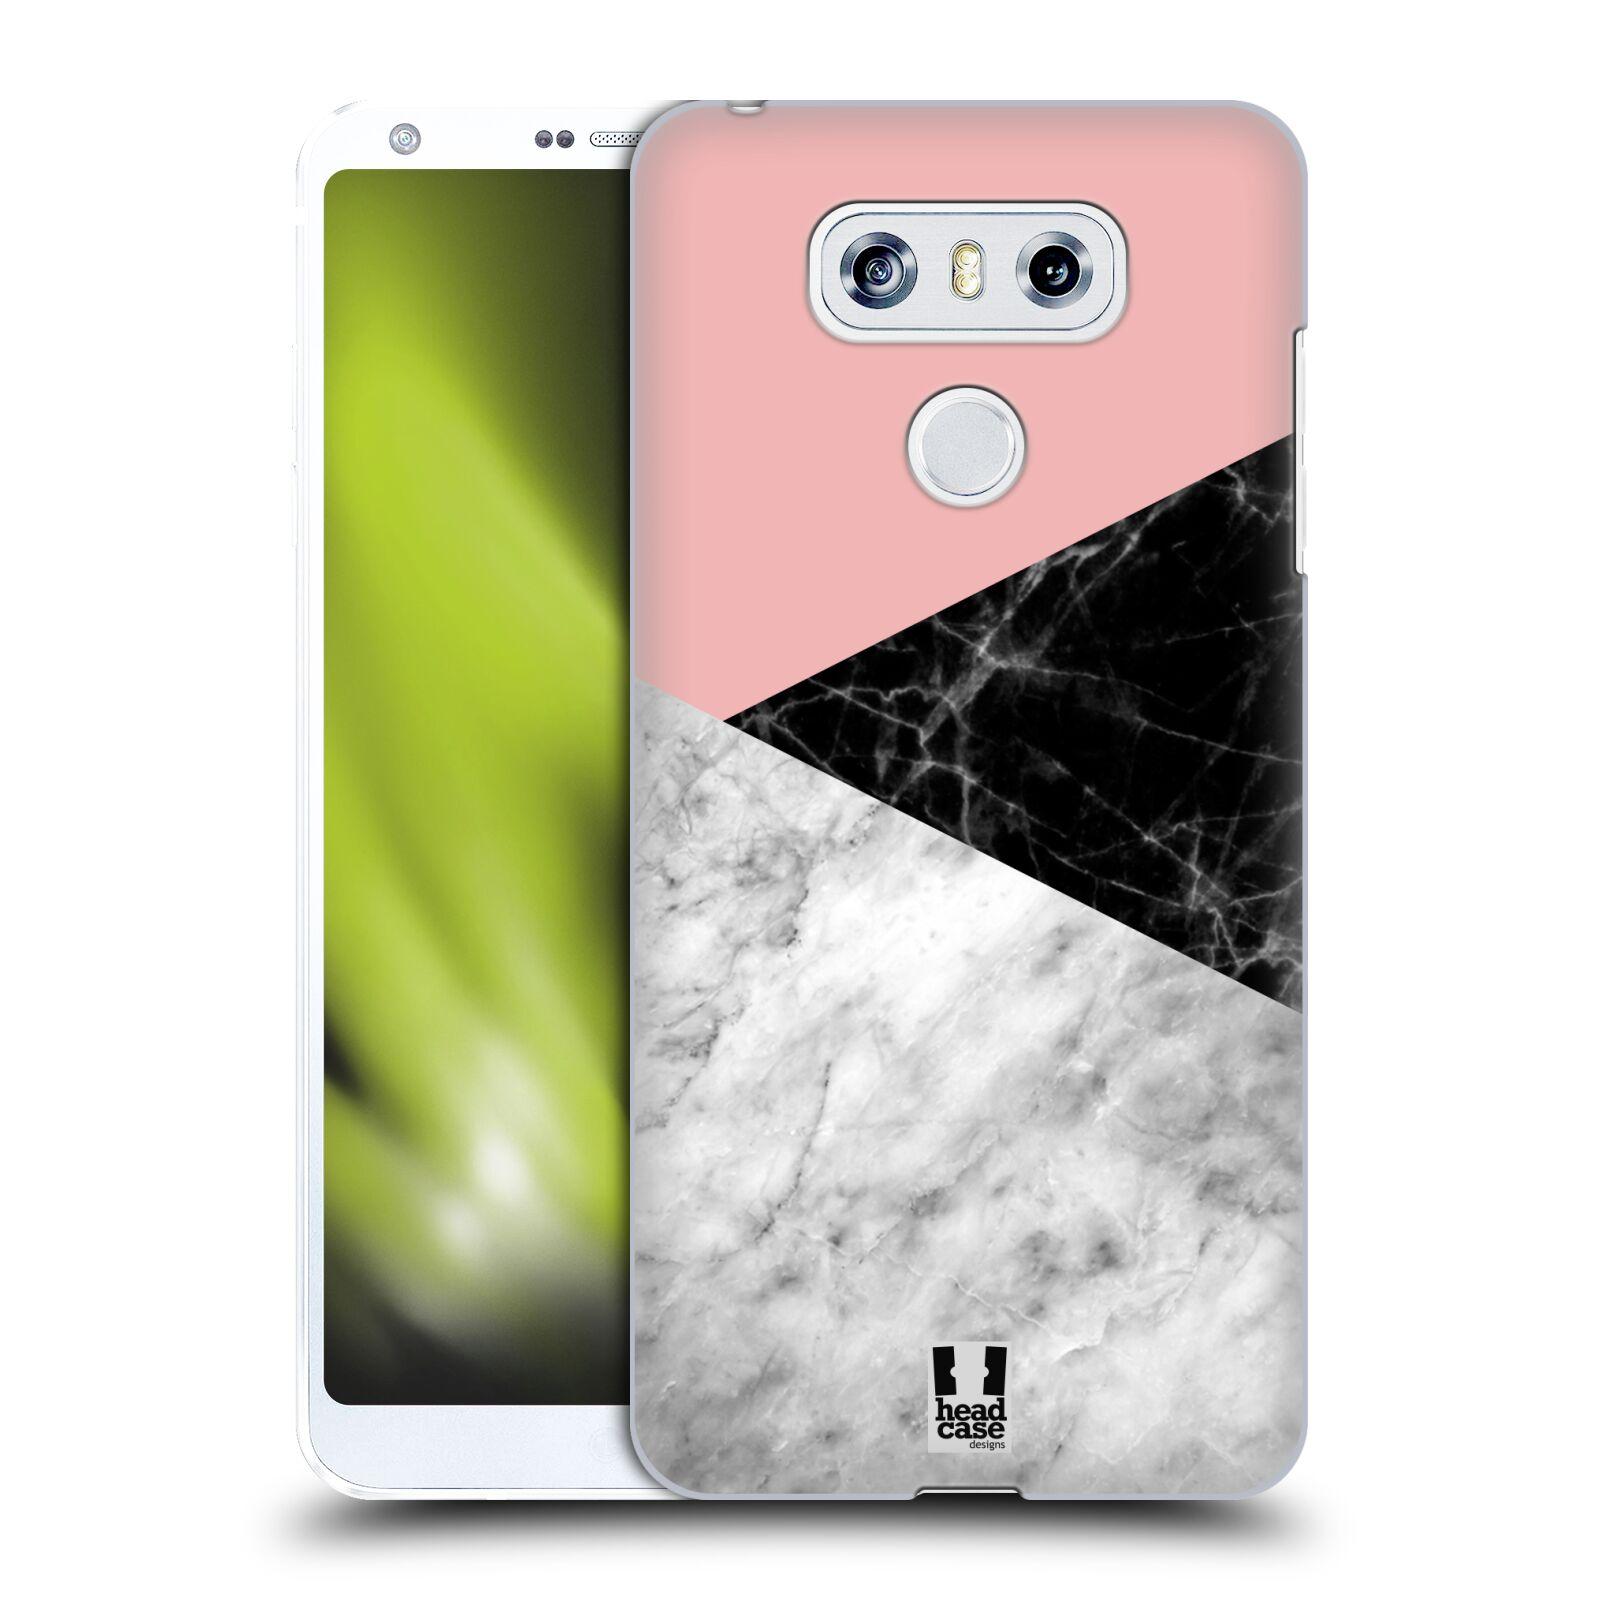 Plastové pouzdro na mobil LG G6 - Head Case - Mramor mix